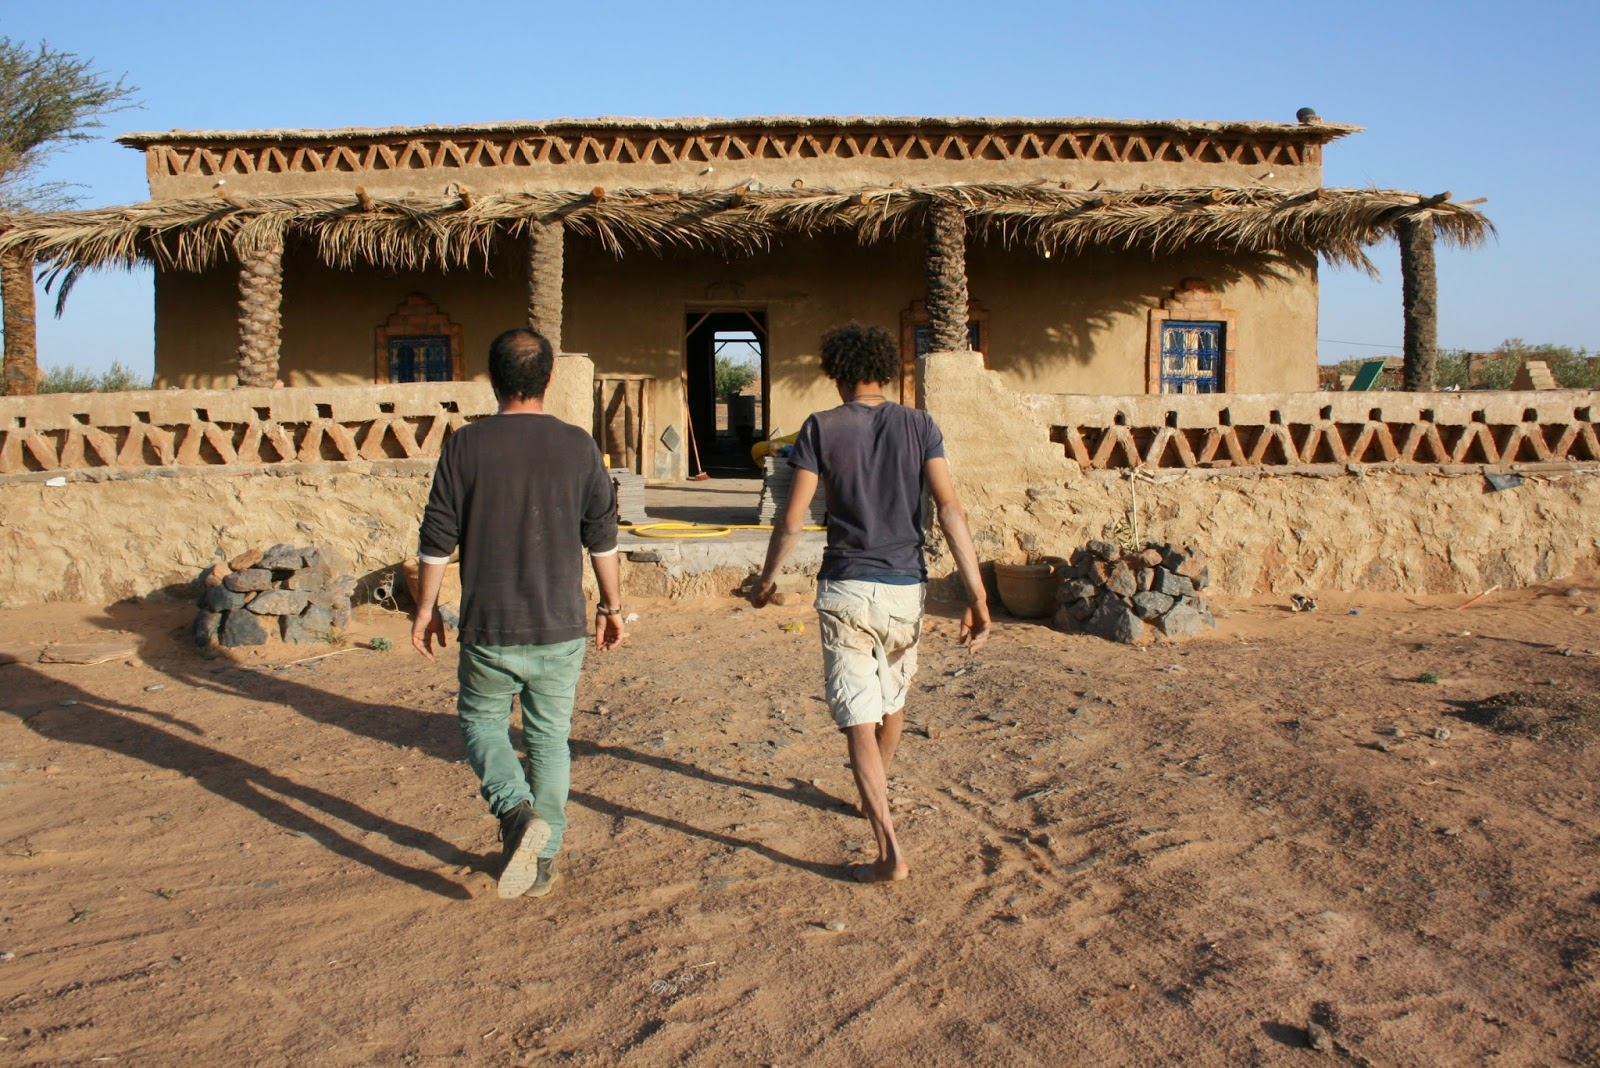 desierto de marruecos, viajar a marruecos, alojamiento en el desierto, bereber, merzouga, erg chebi, aventura